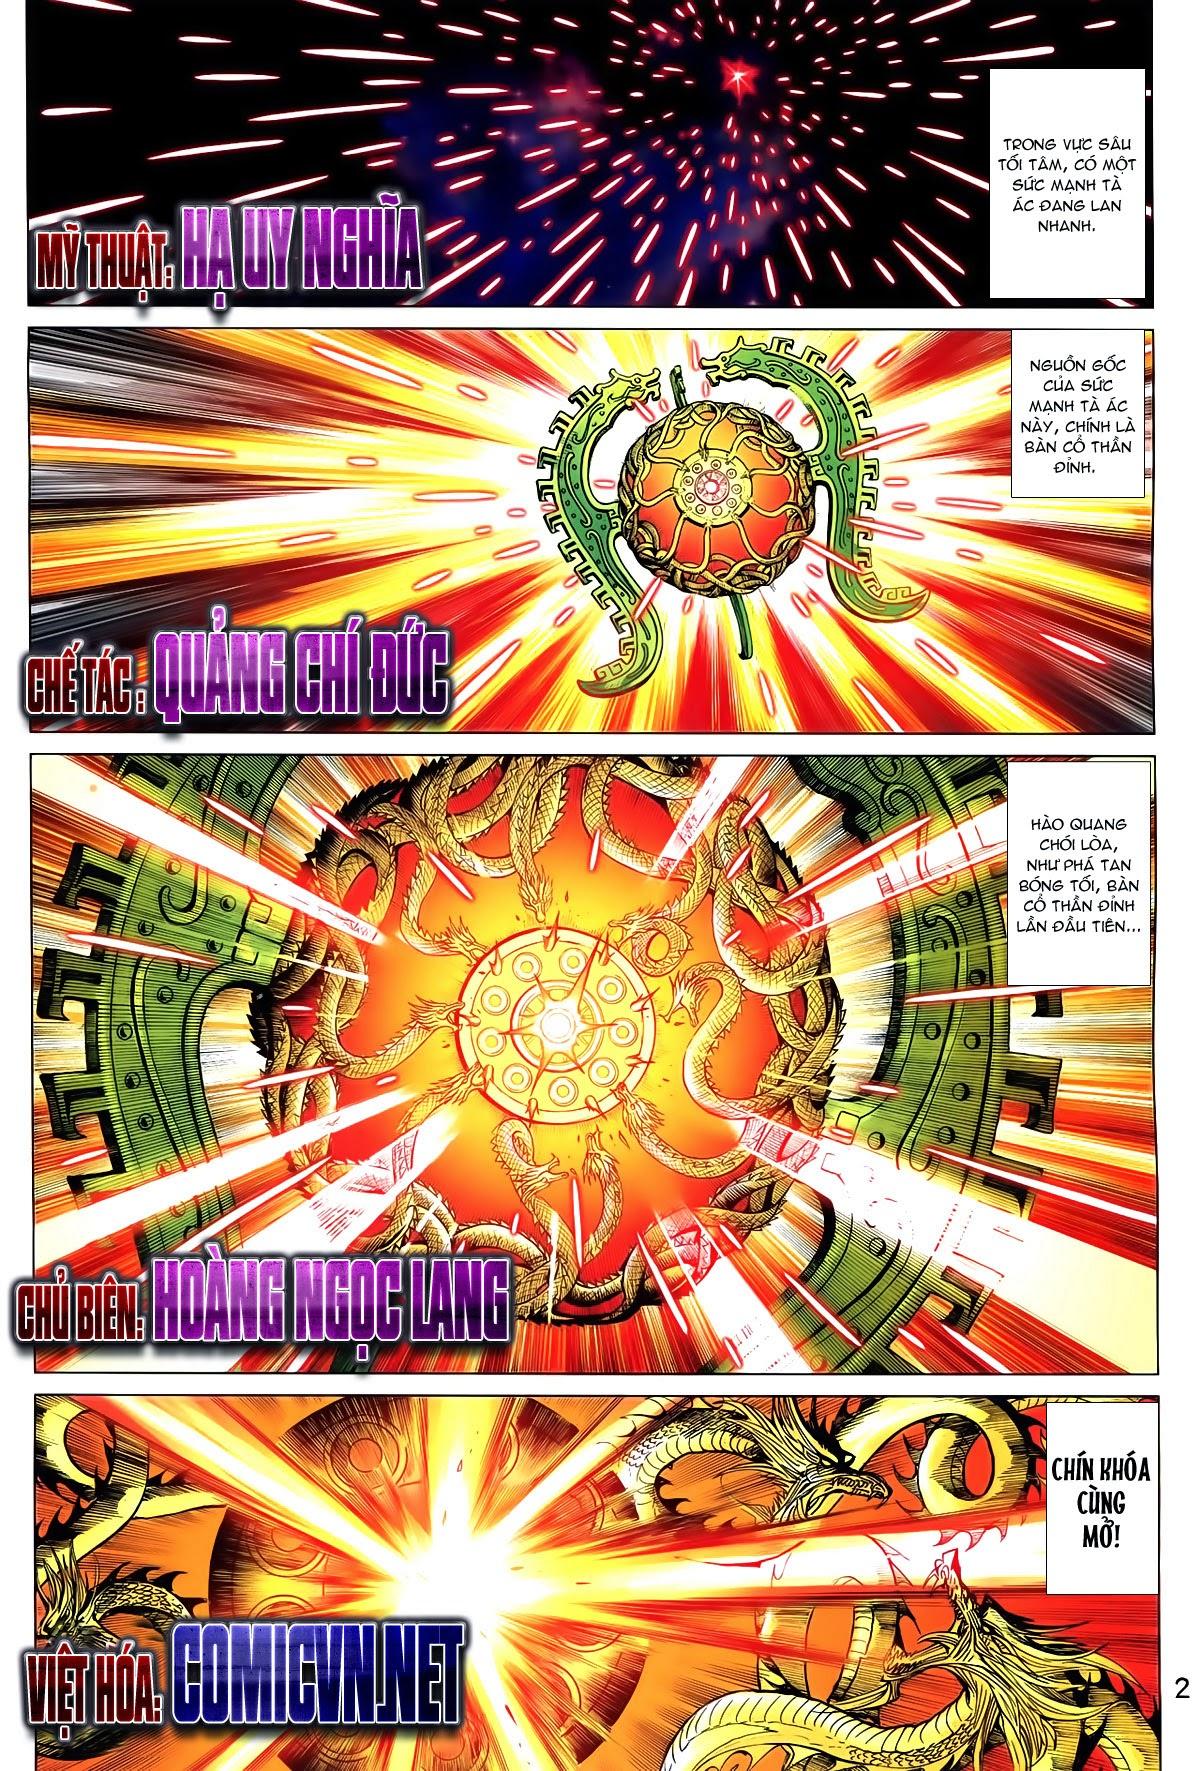 Thần Binh Vấn Thiên chap 36 Trang 3 - Mangak.info